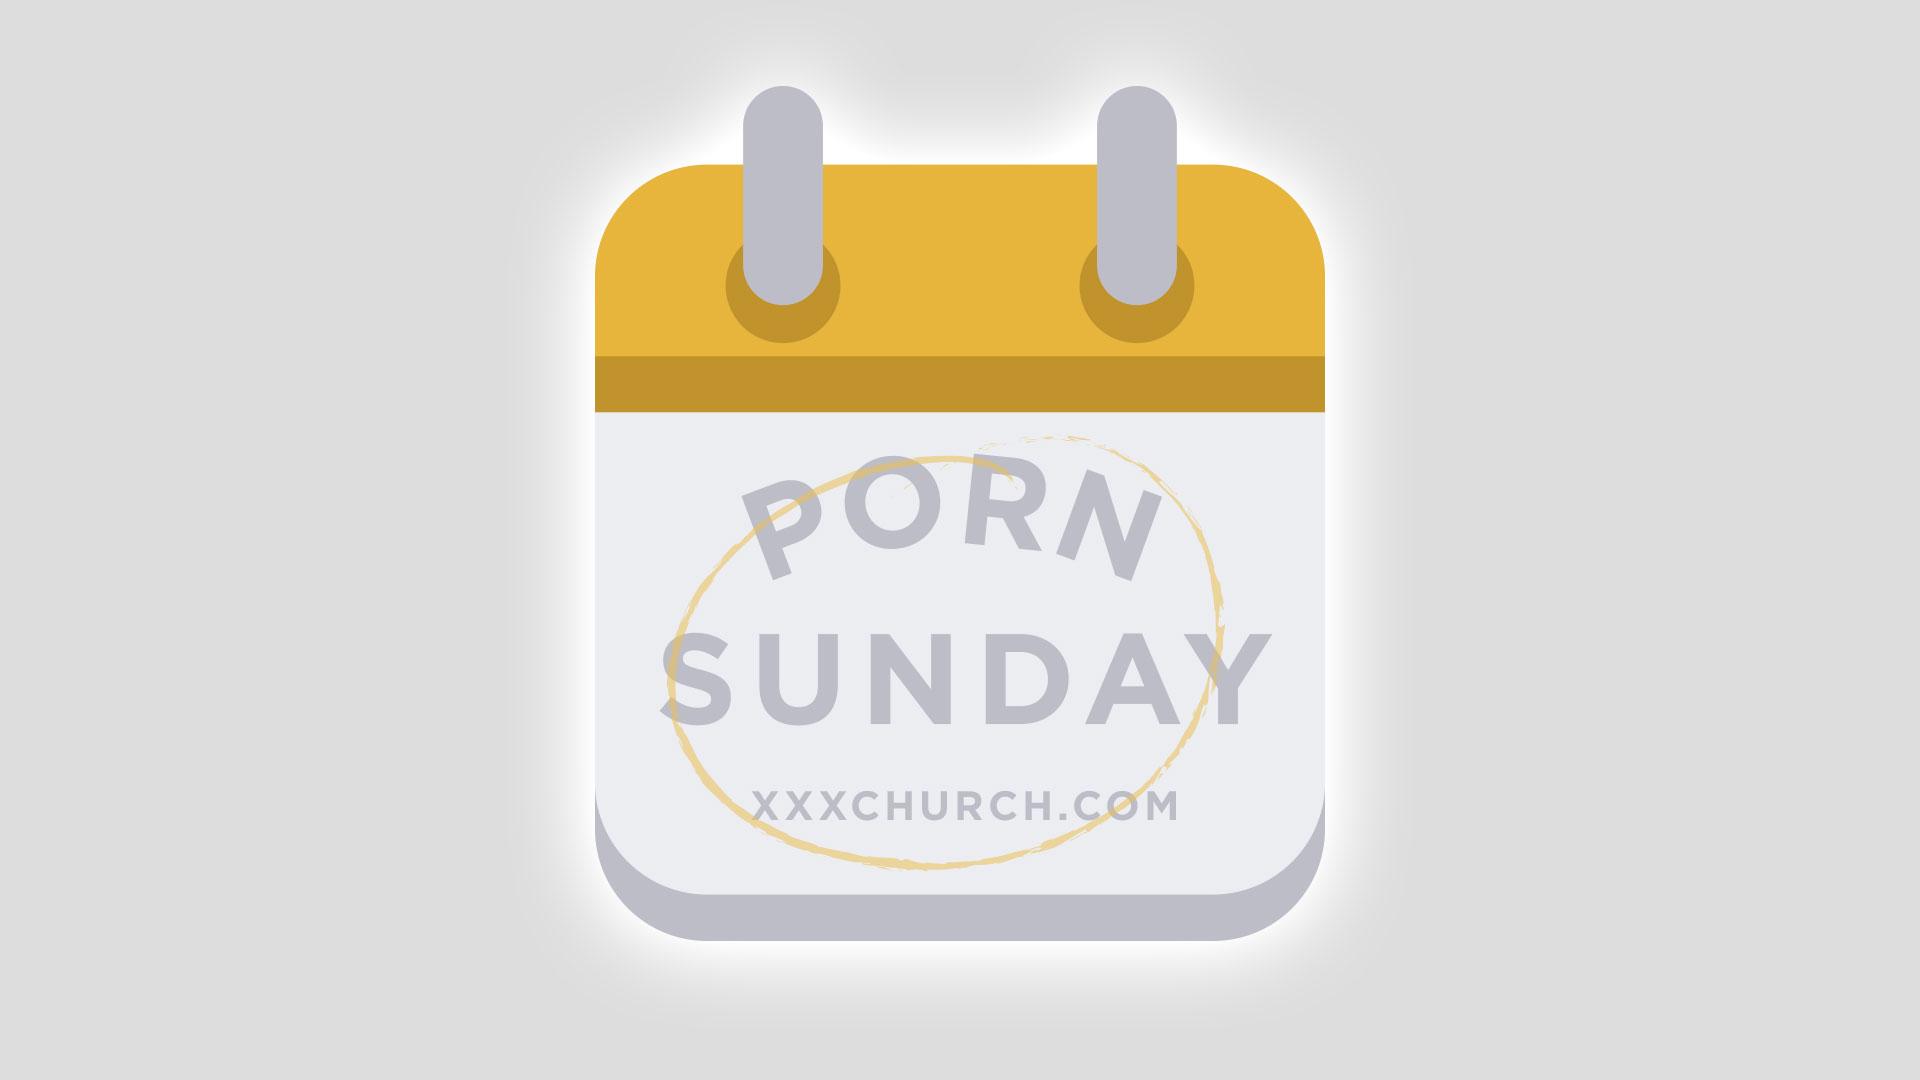 Porn_Sunday